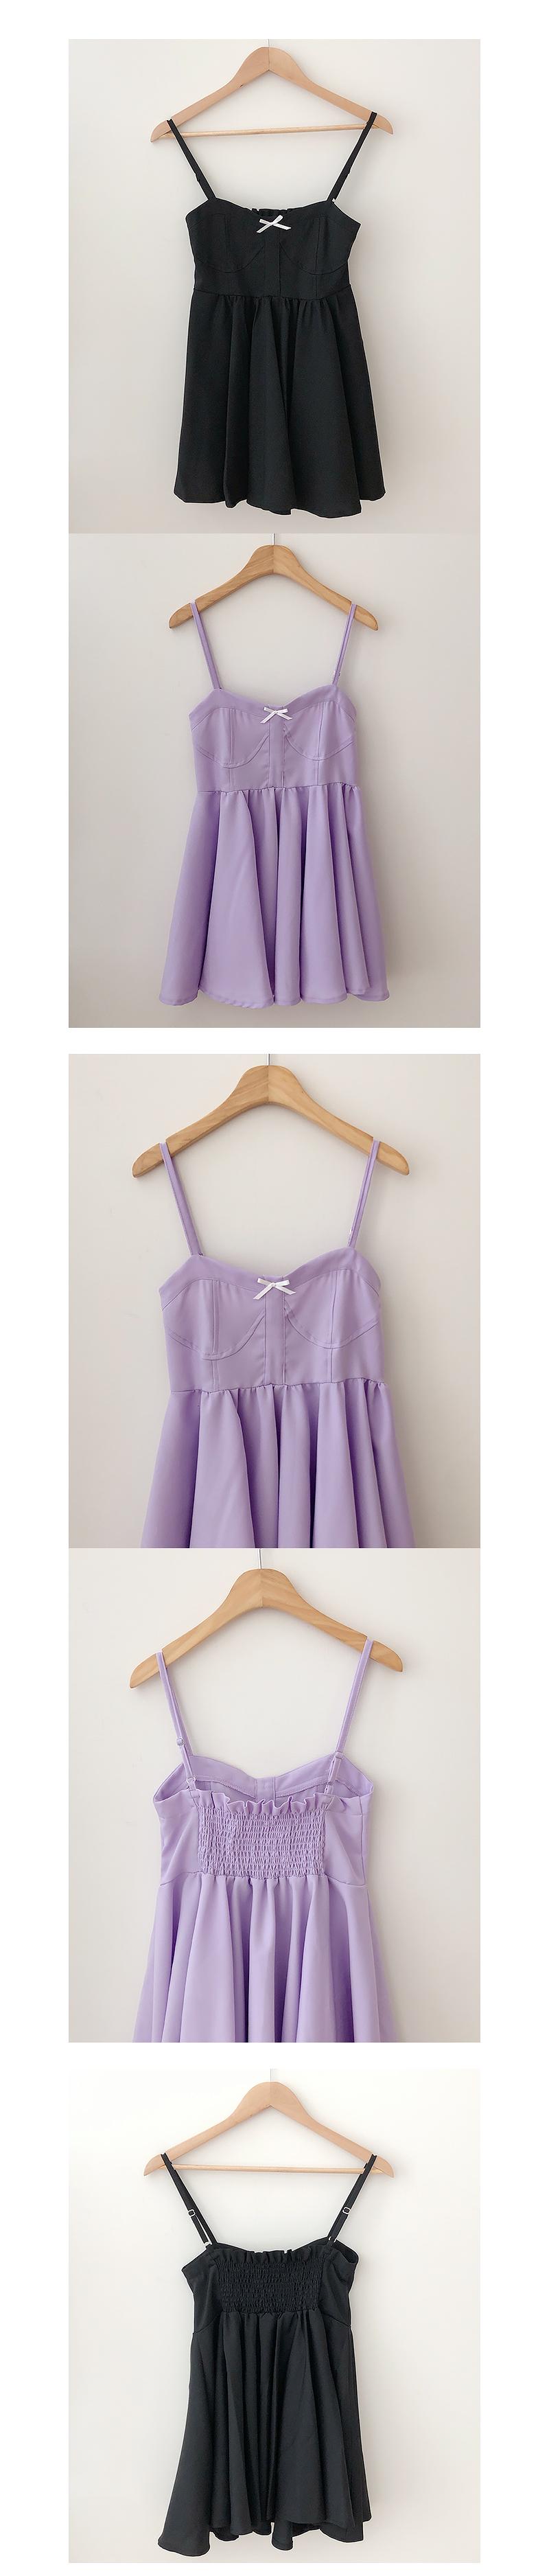 Rossley Ribbon Smoke Dress